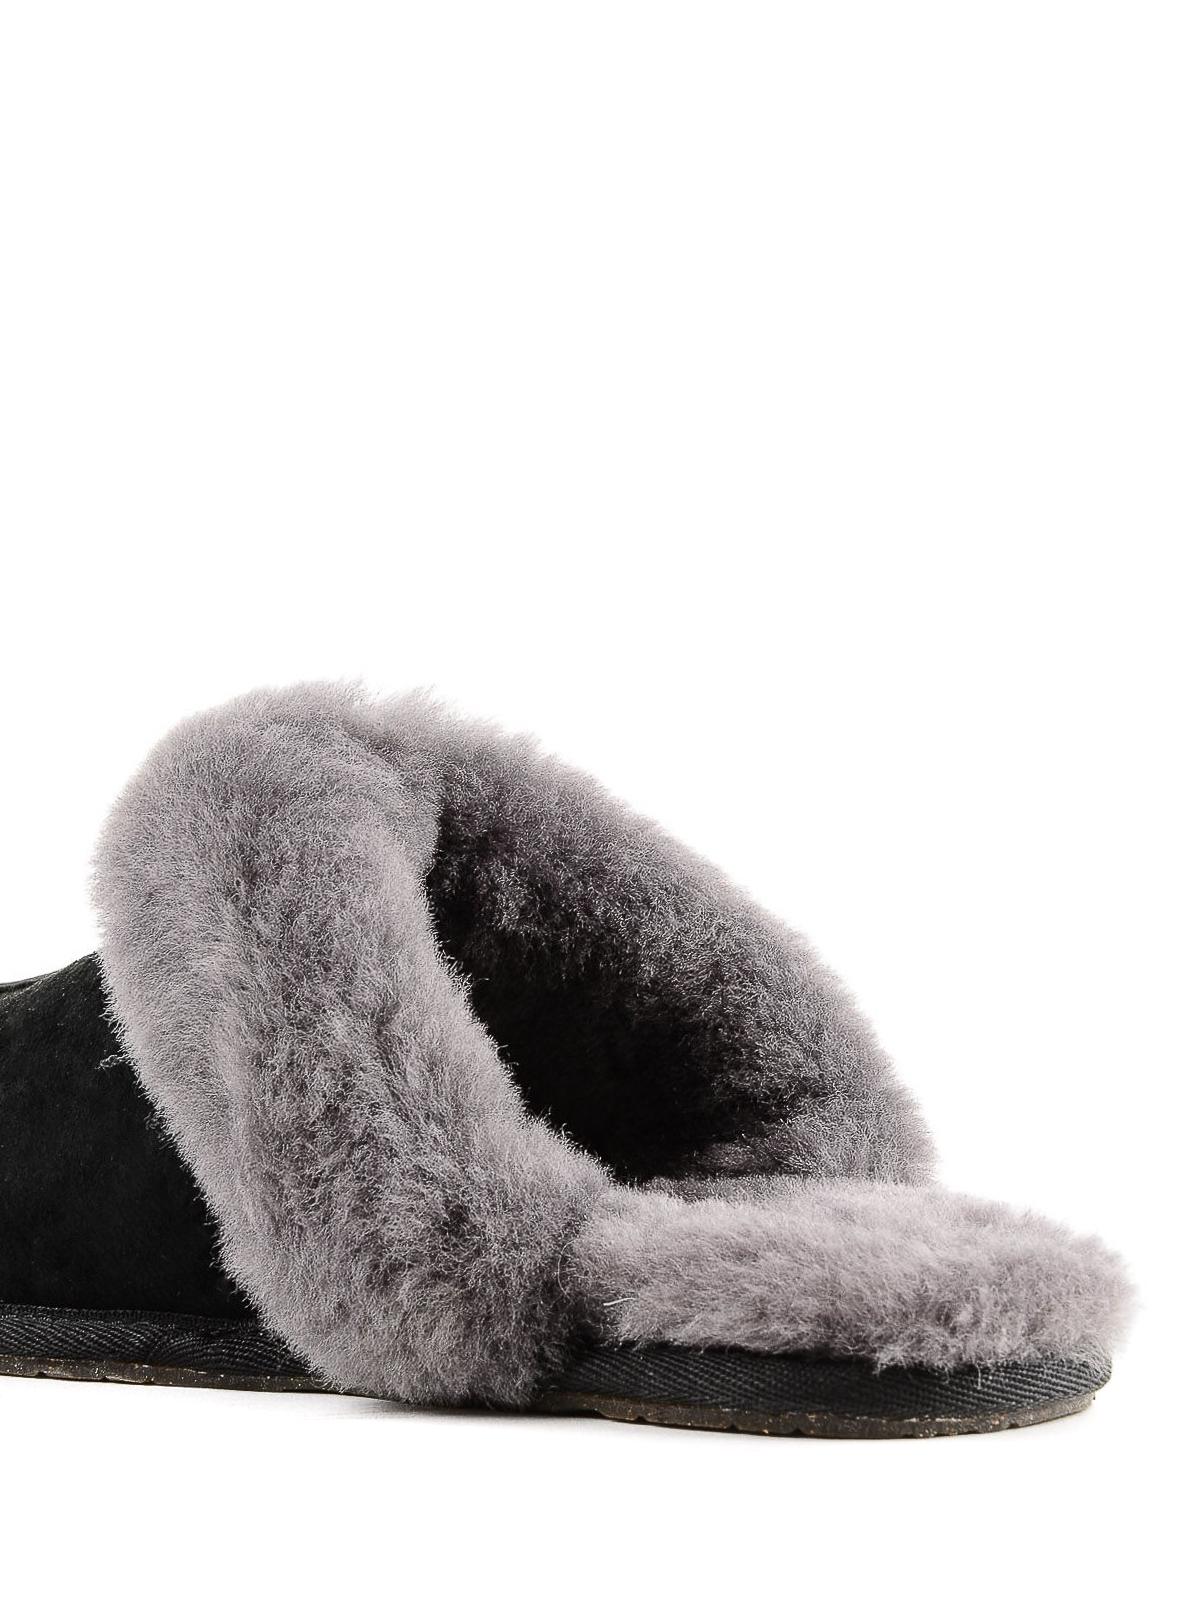 b9944b8a5fd Ugg - Scuffette II slippers - mules shoes - 5661BLACKGREY | iKRIX.com